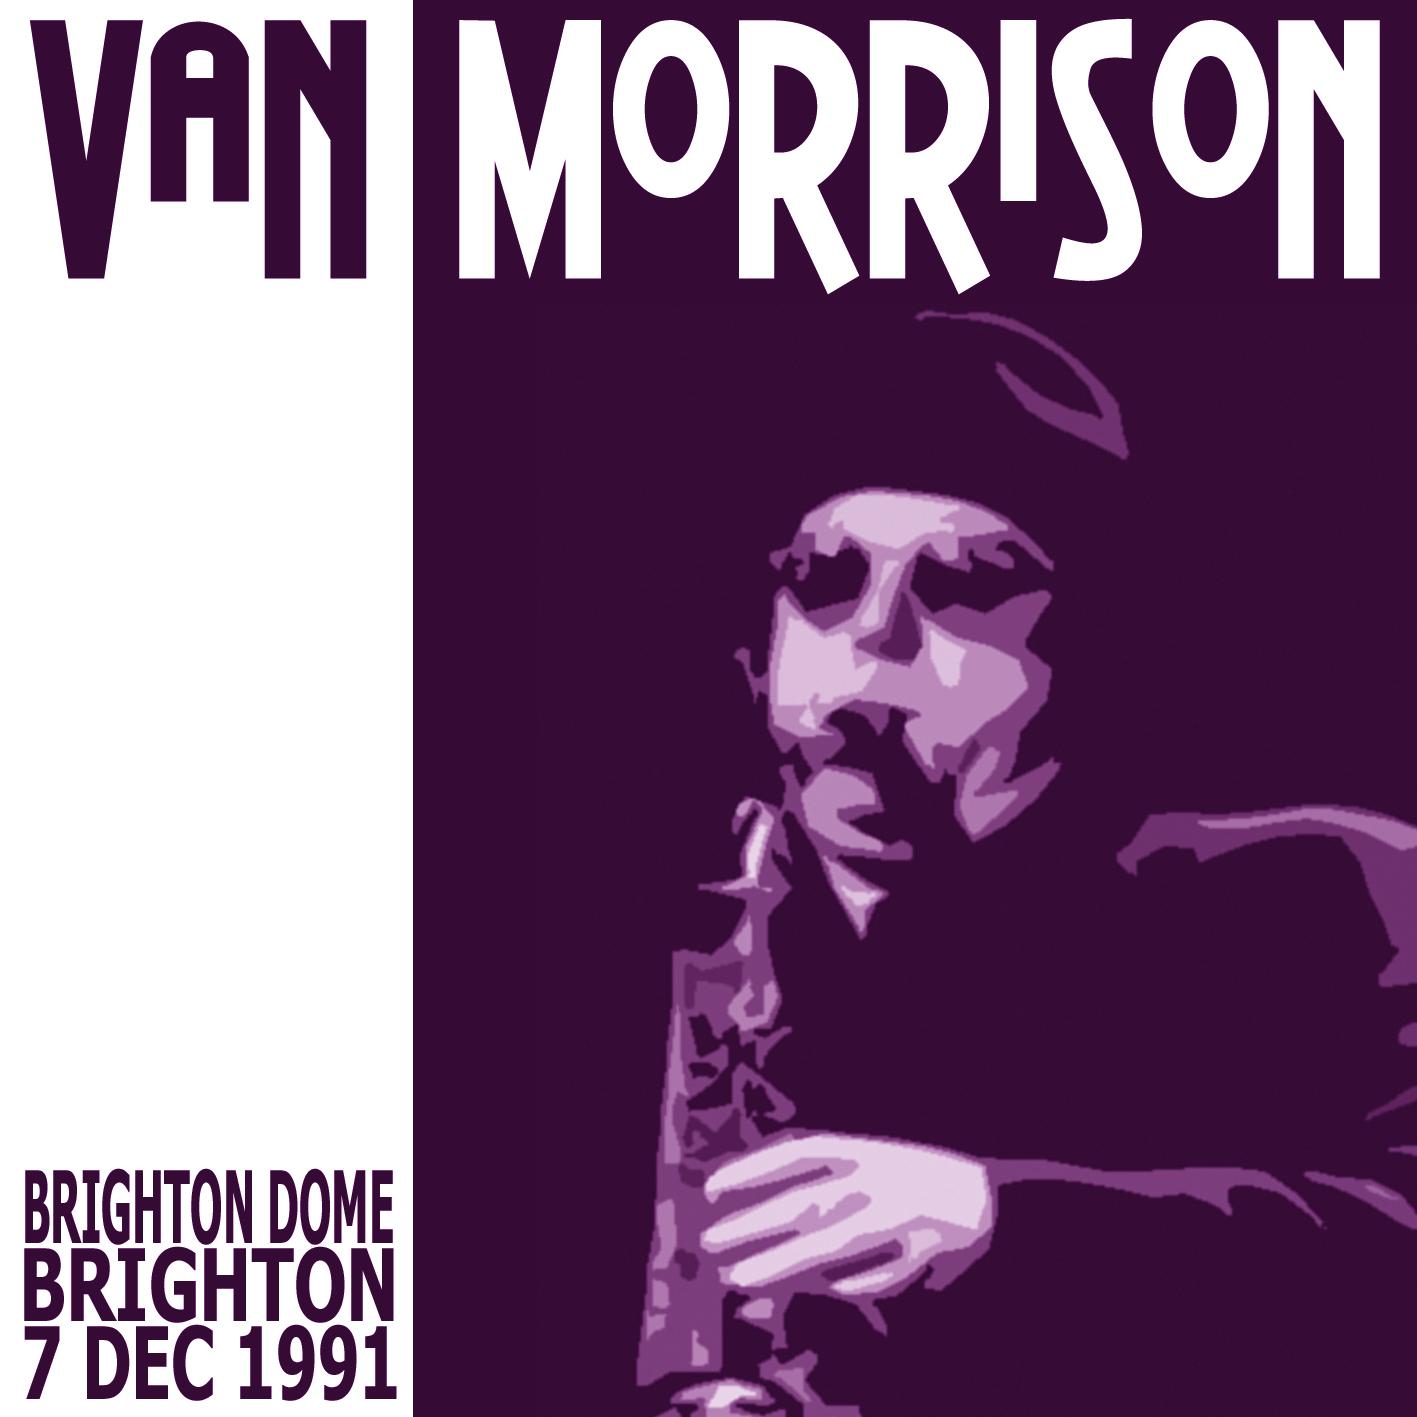 VanMorrison1991-12-07BrightonDomeUK.jpg